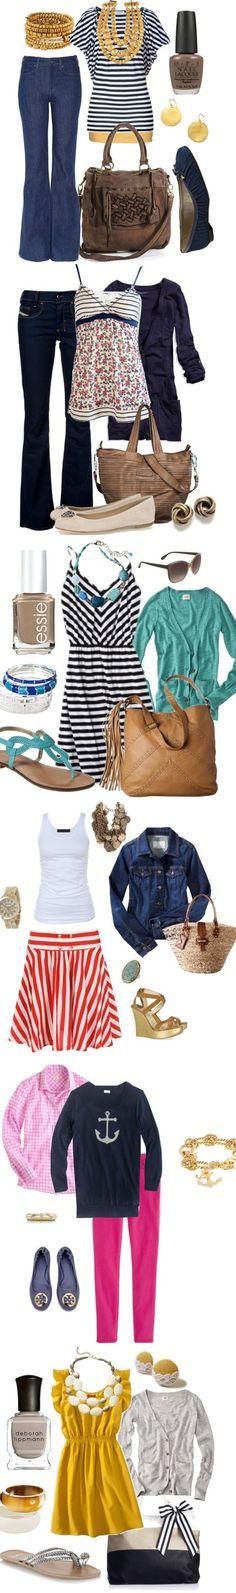 originales combinaciones...  Nautical Spring Fashion 2013 at www.honeybearlane.com #spring #fashion